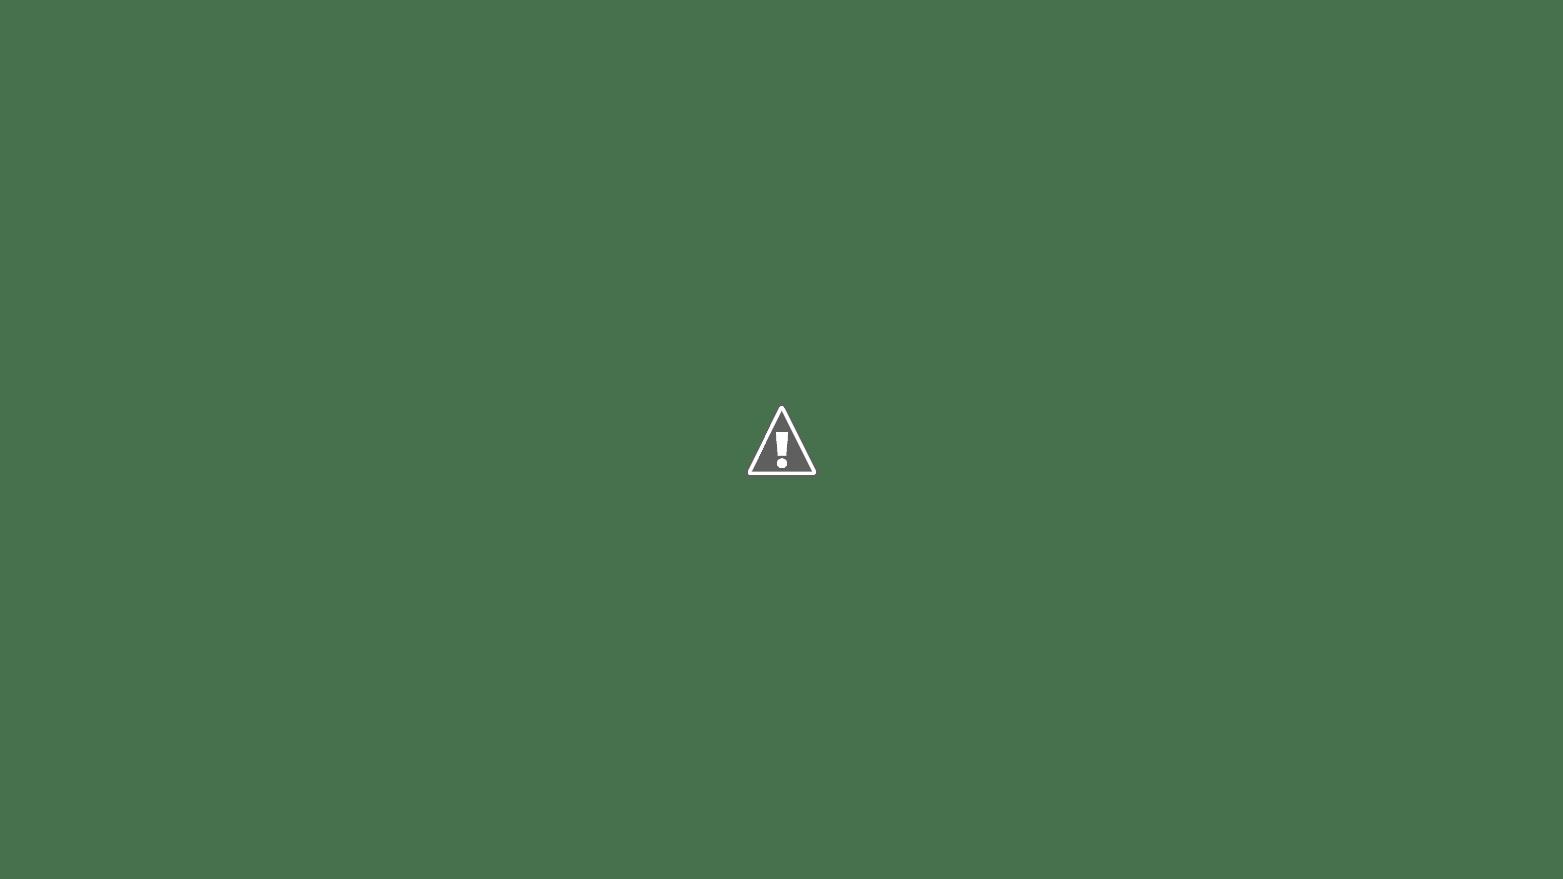 ravioli dolci fritti & al forno